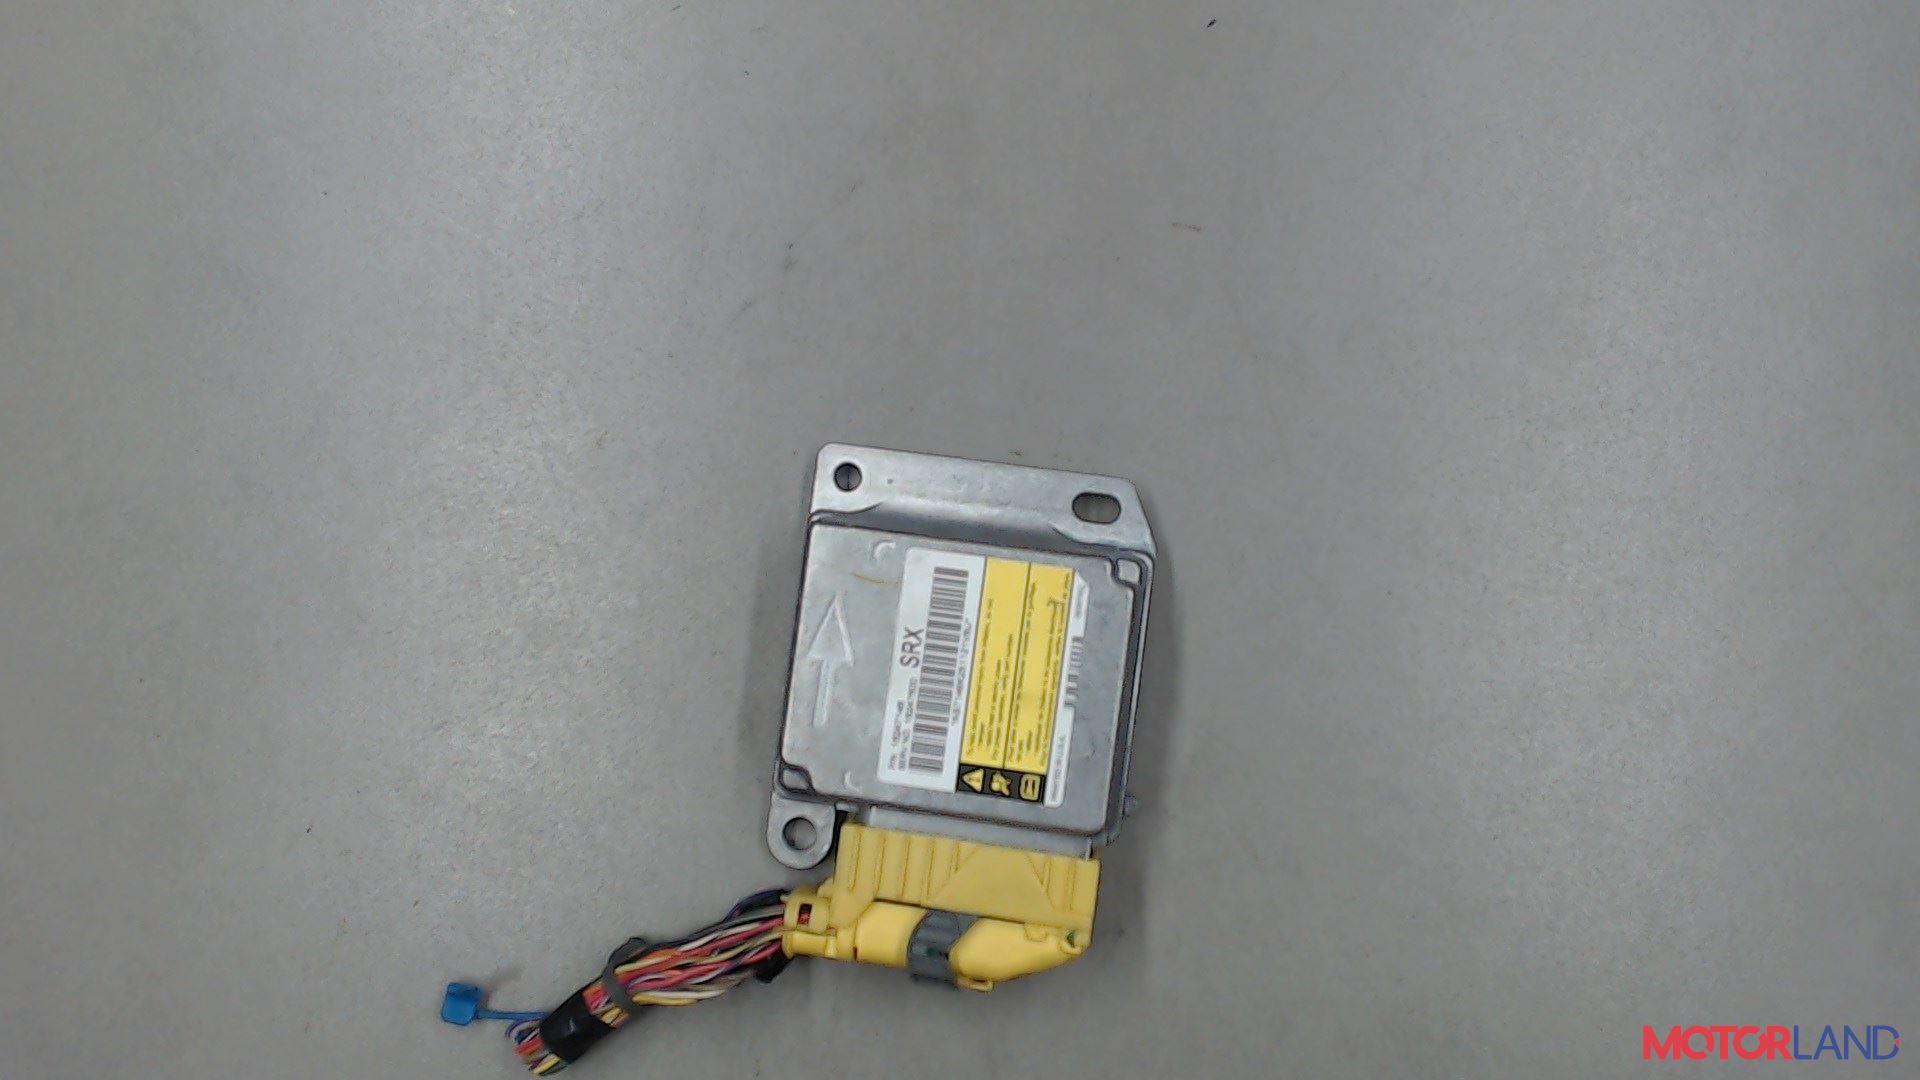 Блок управления (ЭБУ) Cadillac SRX 2004-2009, Артикул 5022614 #1